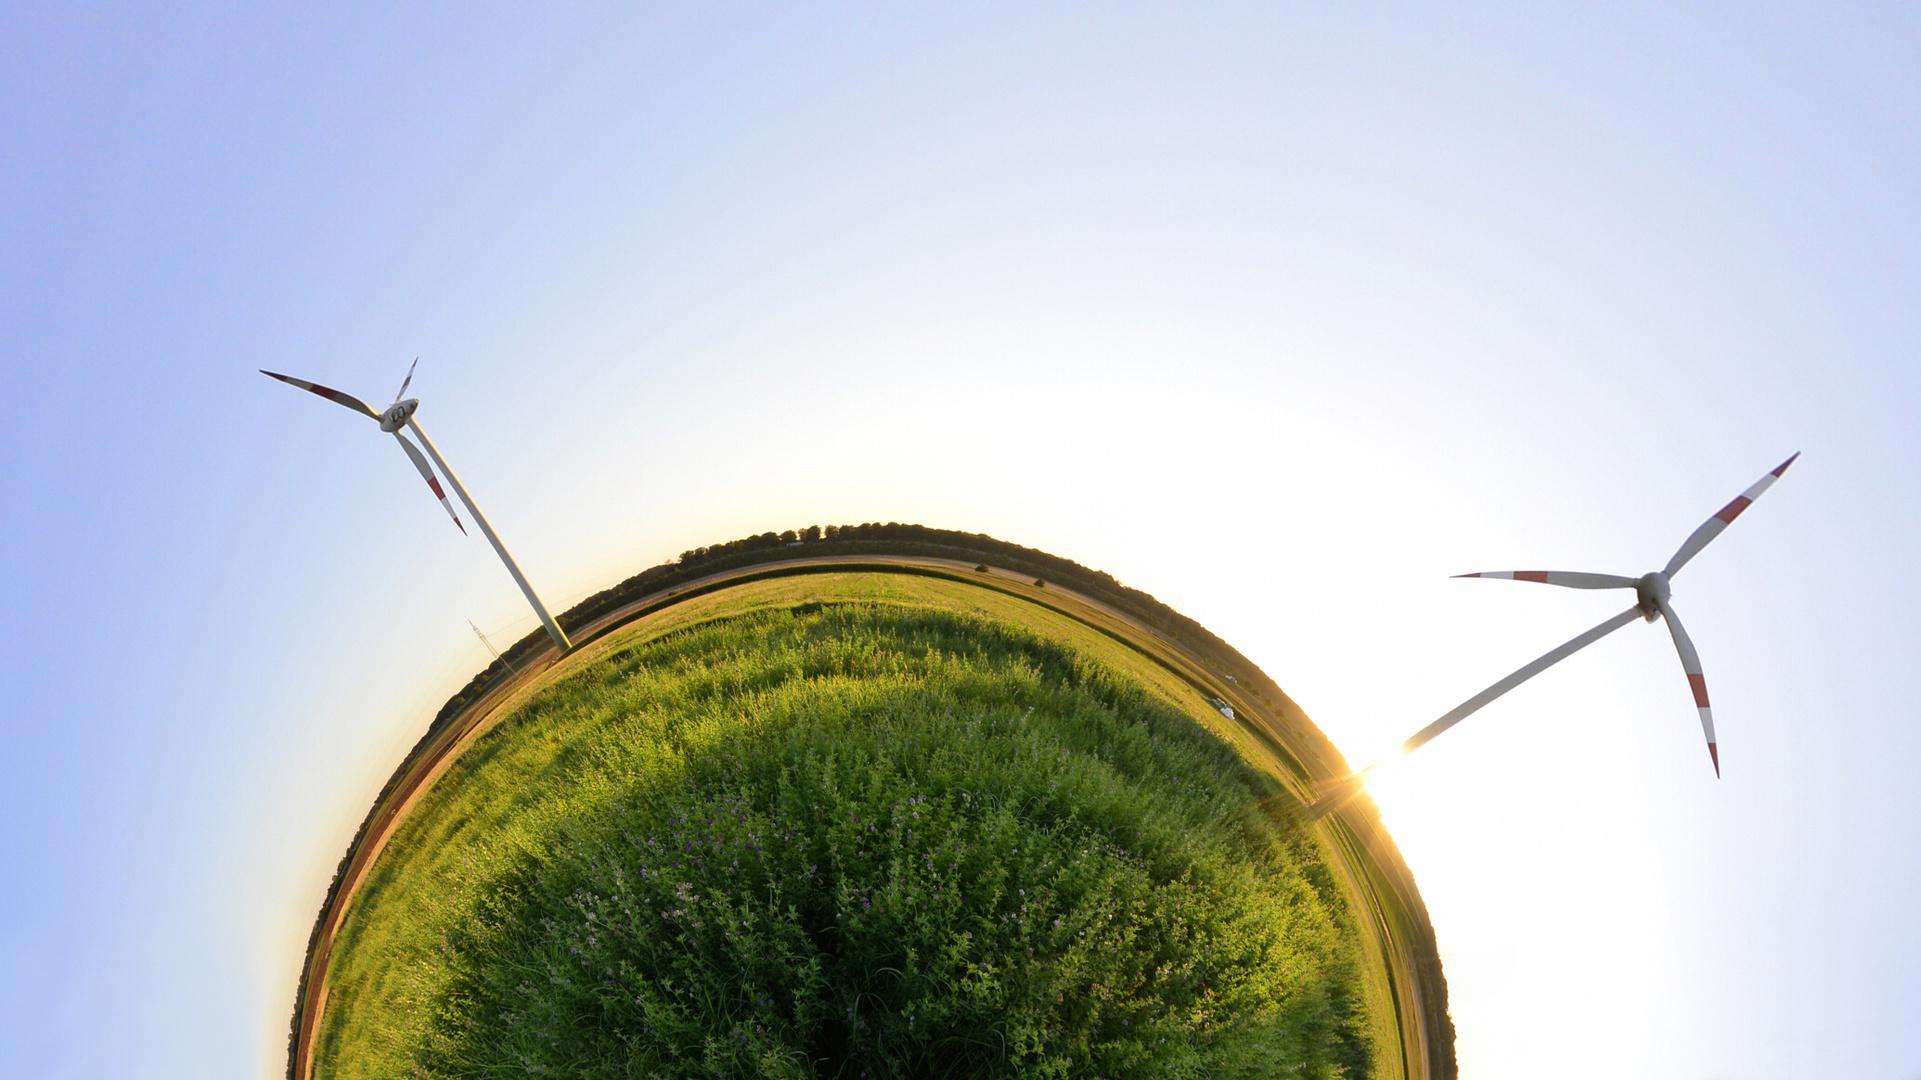 Windkraftwerke & Fisheye